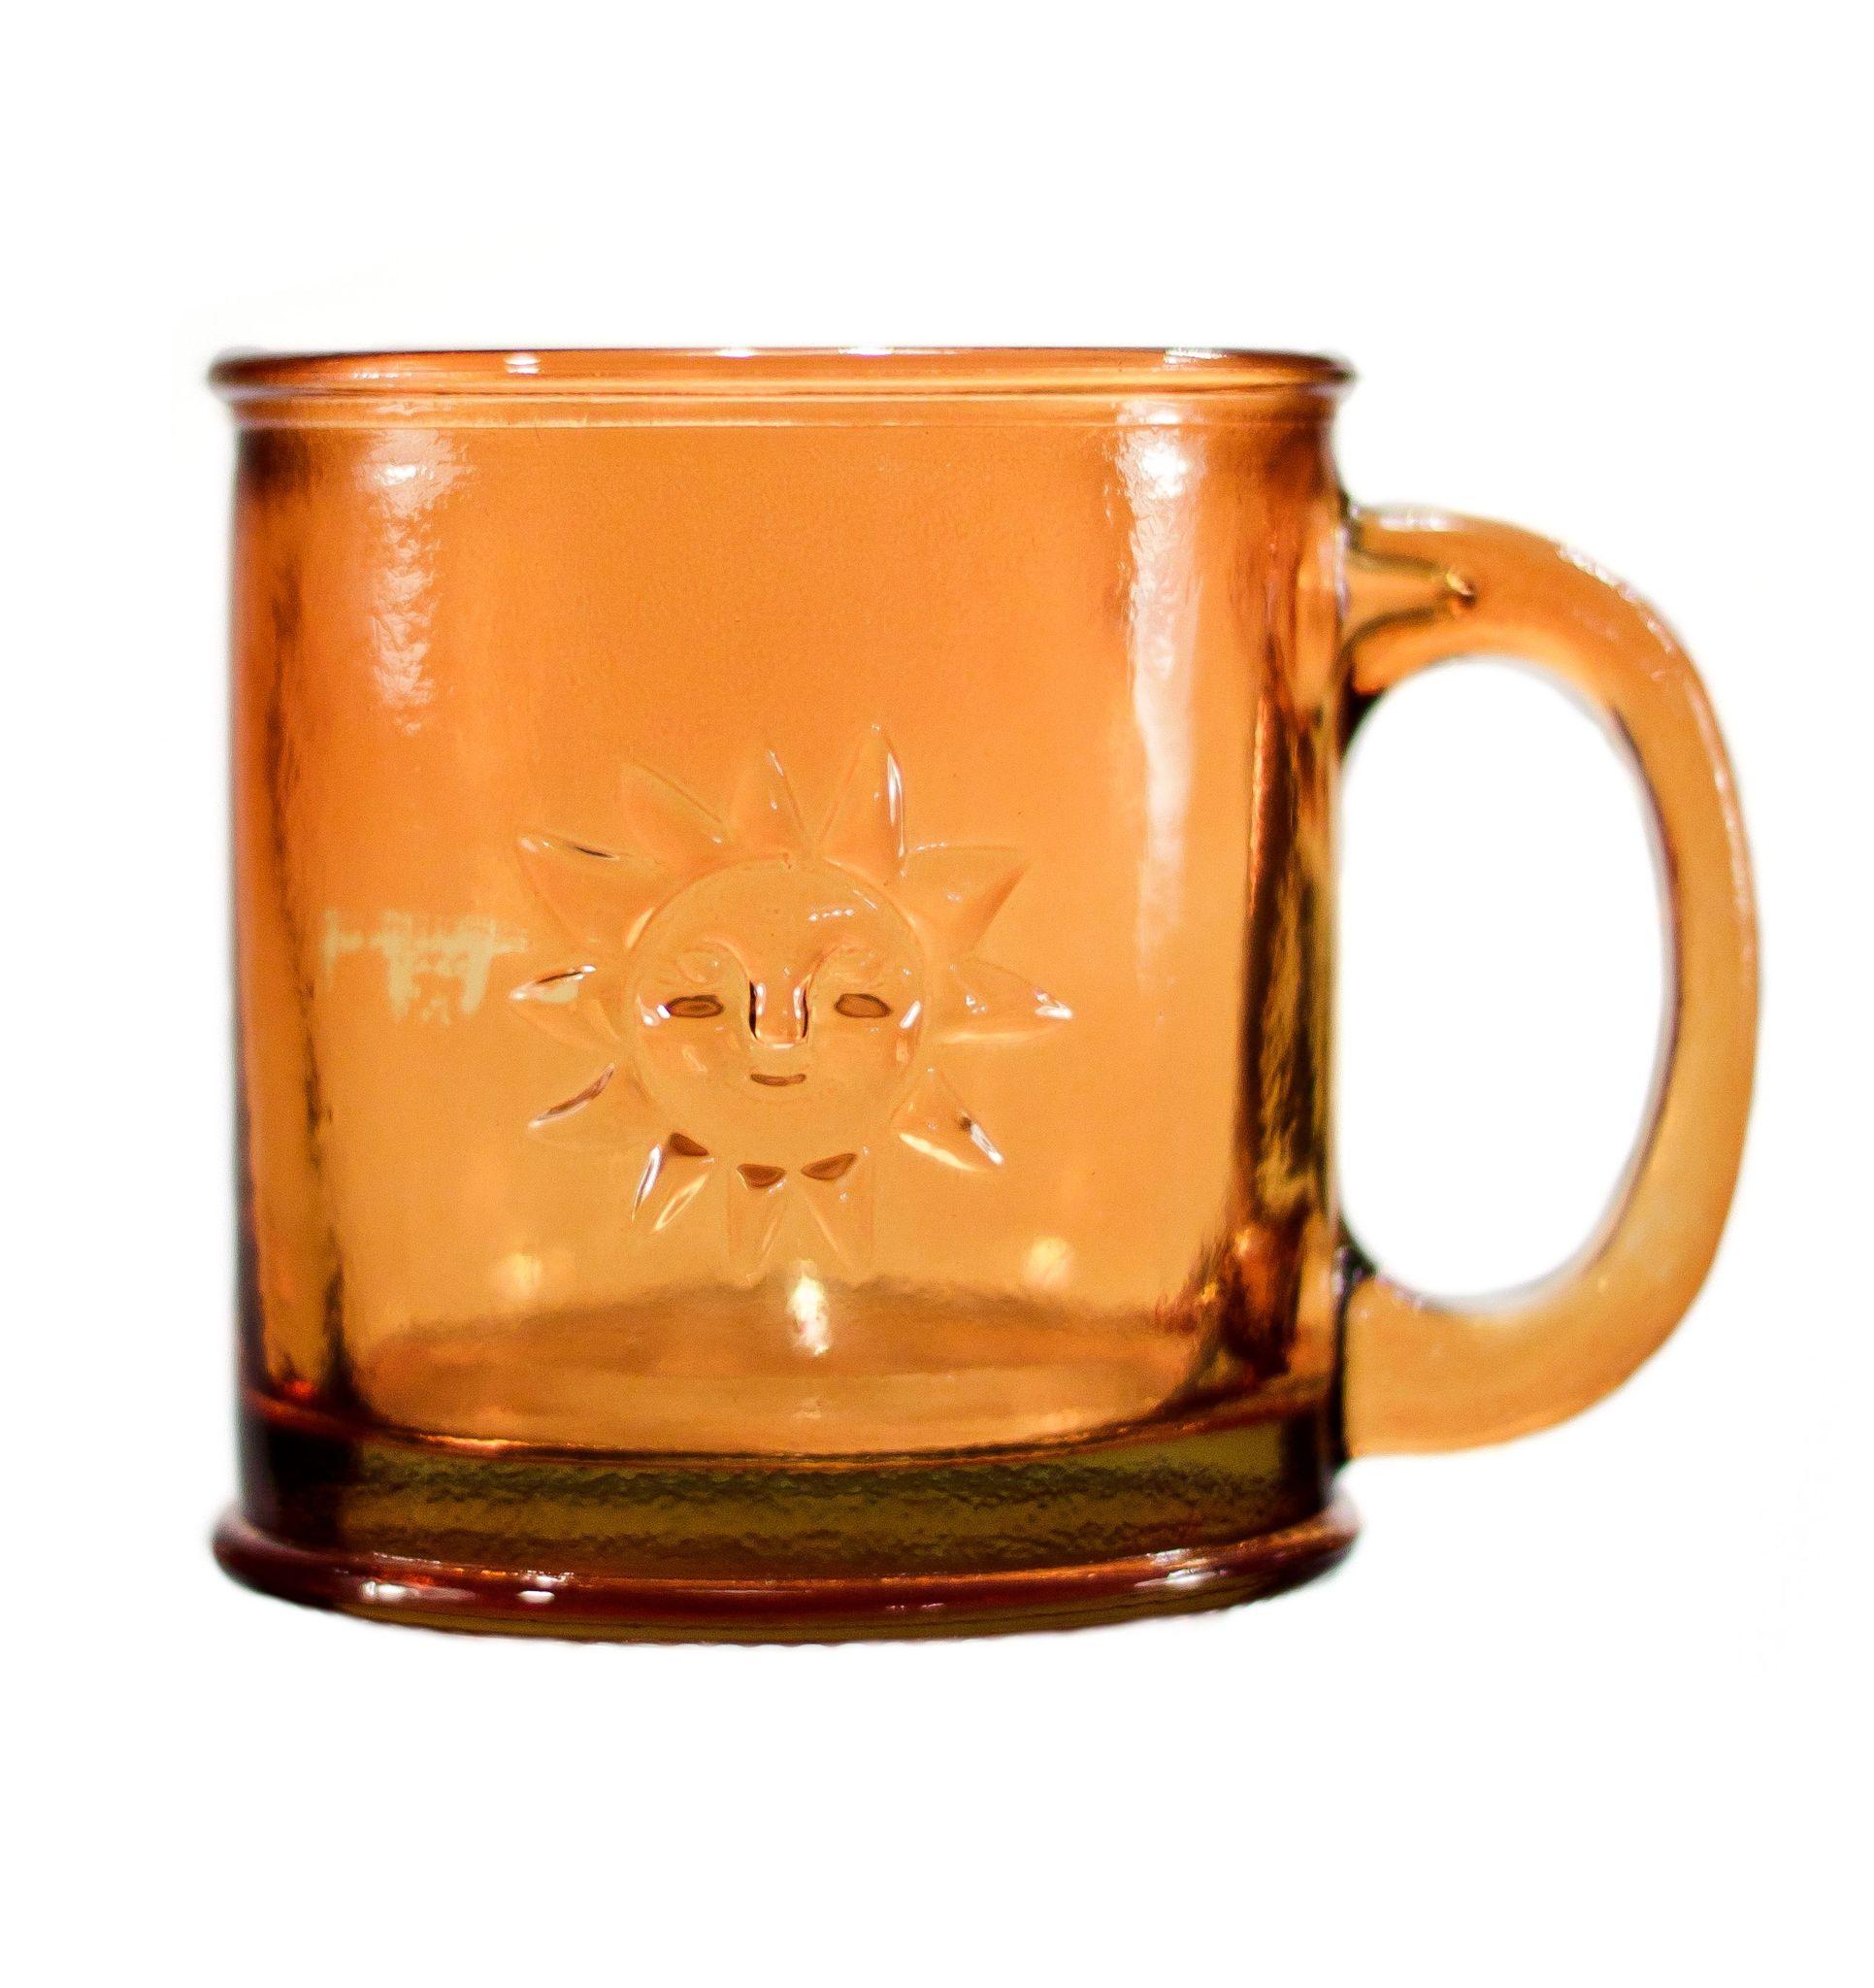 Кружки Кружка 350 мл San Miguel Sol оранжевая kruzhka-350-ml-san-miguel-sol-oranzhevaya-ispaniya.jpg